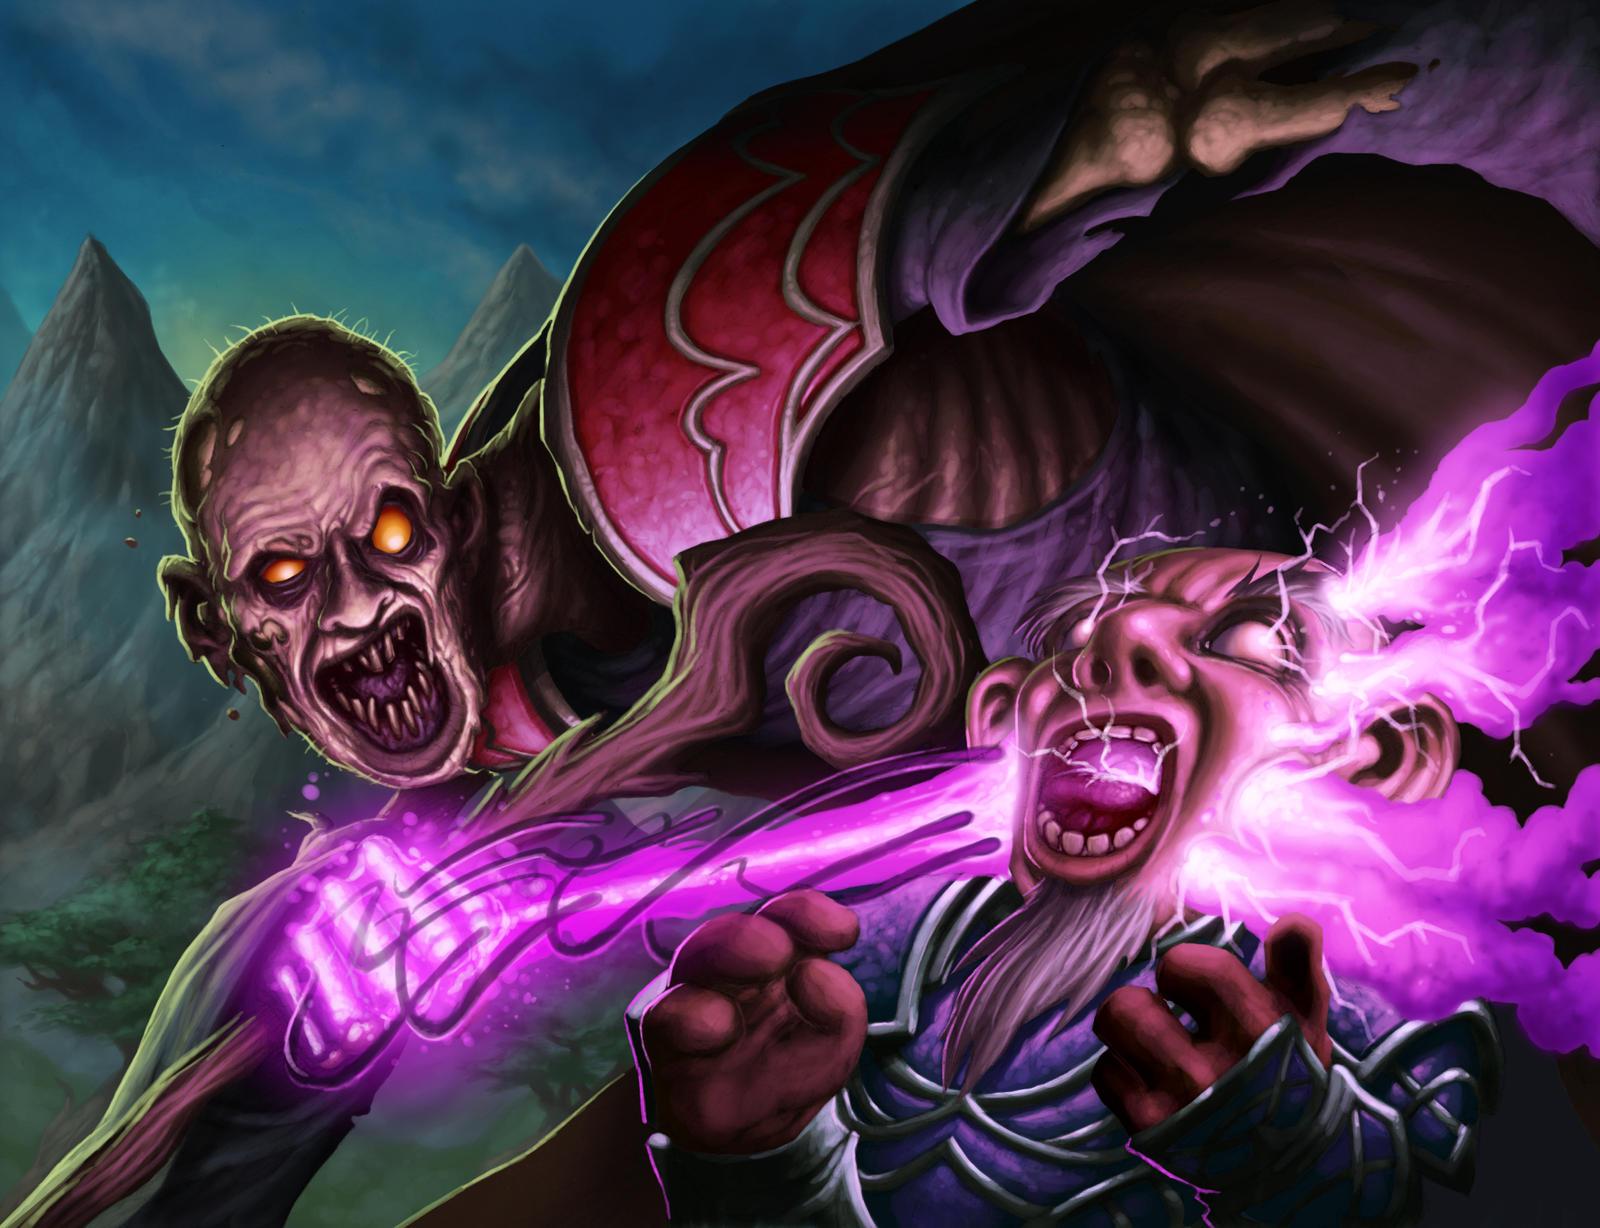 Charkov - World of Warcraft by DaveAllsop